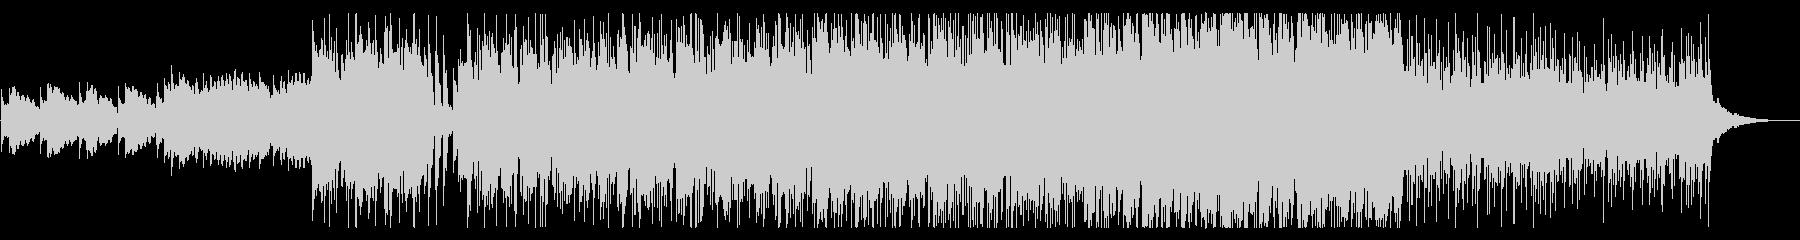 KANTハーモニクスキラキラBGMの未再生の波形